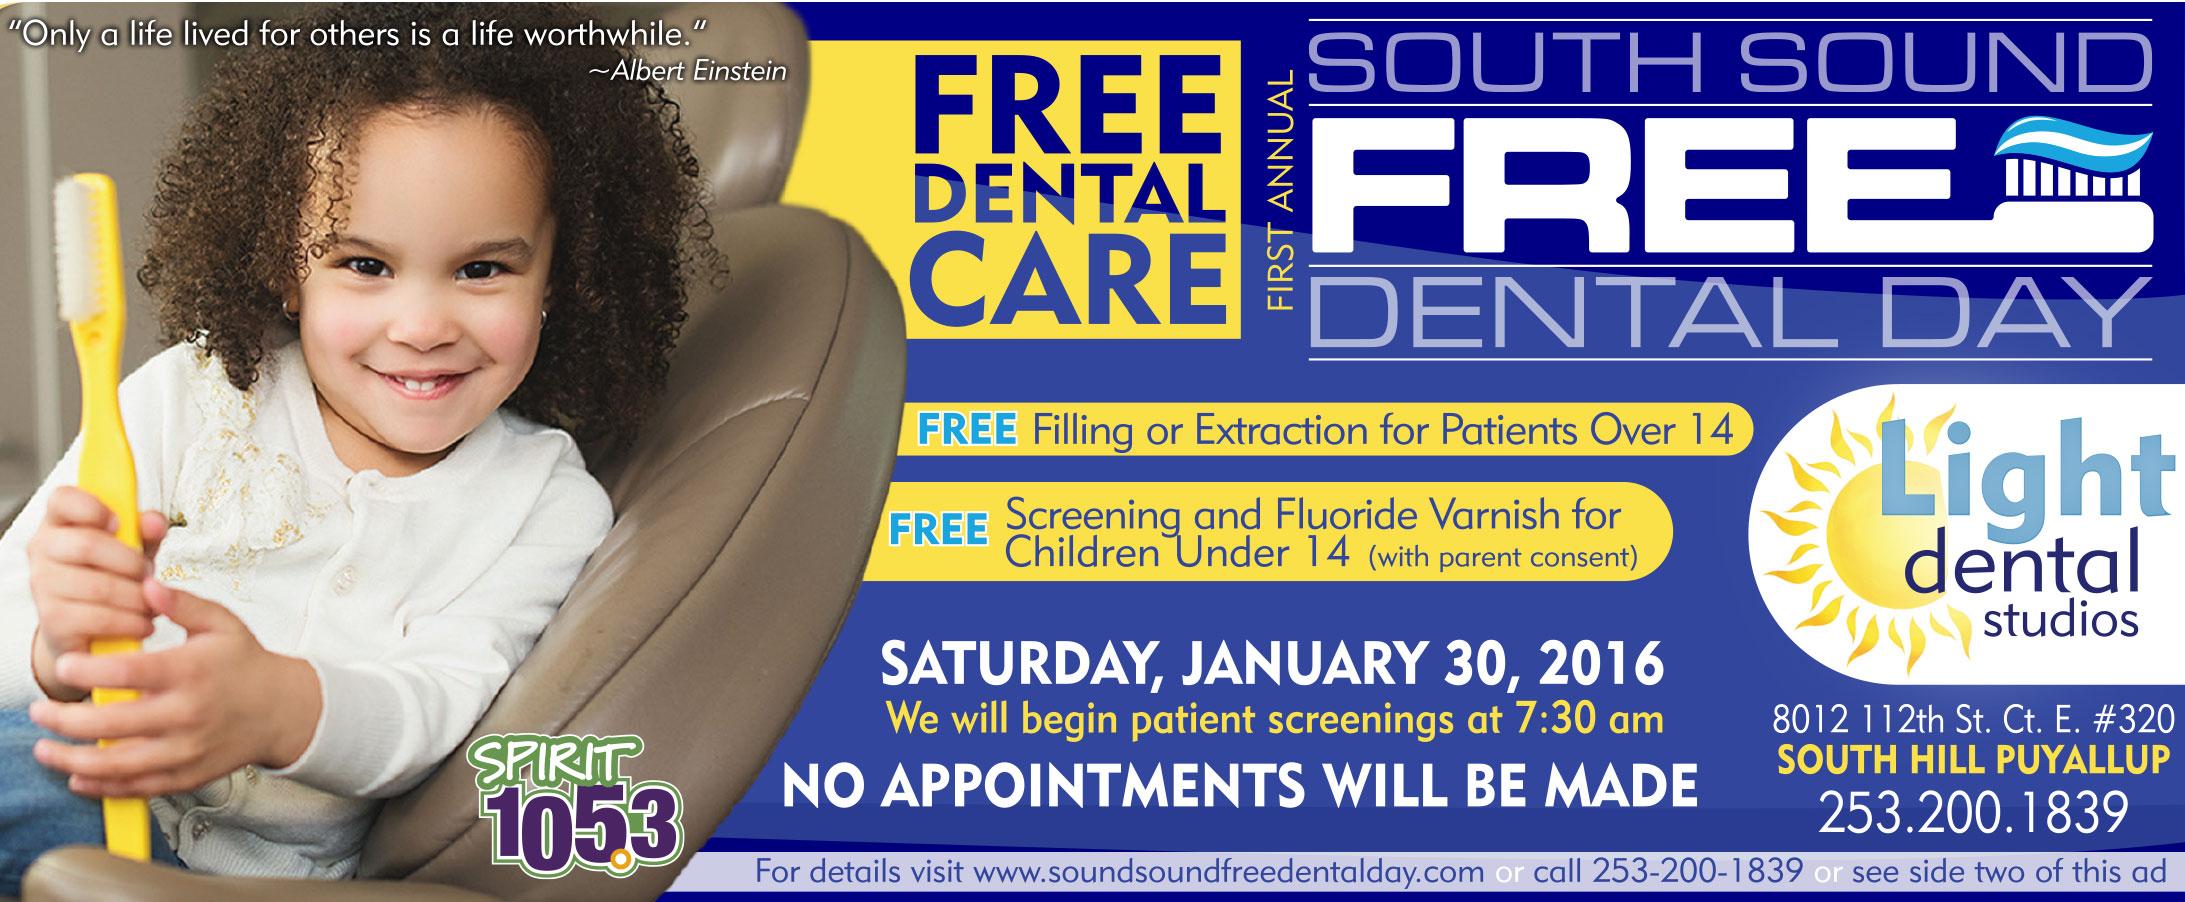 FREE Community Dental Day